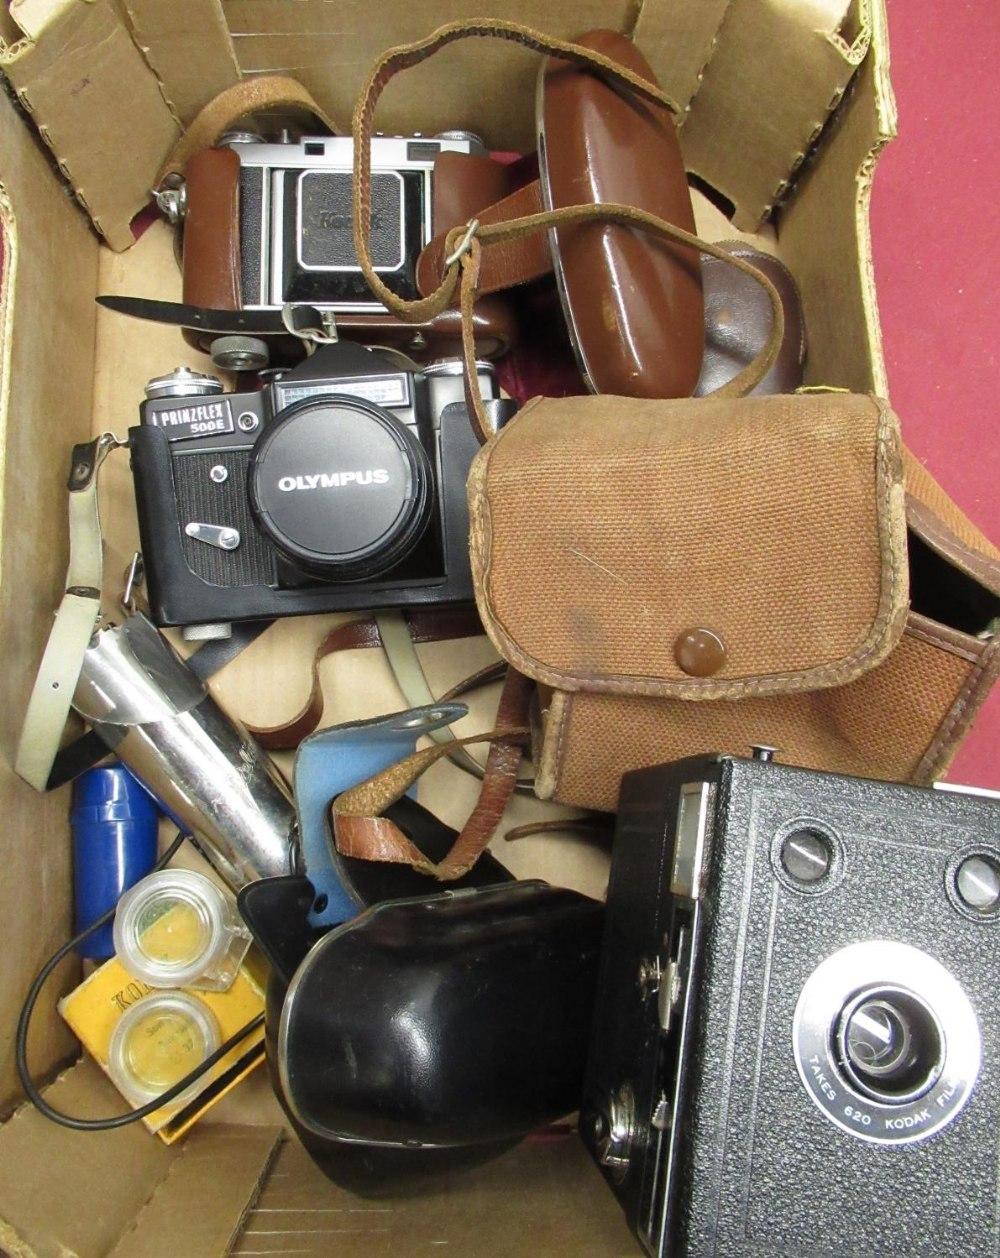 Kodak Retina IIa, Prinzflex 500E camera, Kodak box camera, small tripod, light meter, etc